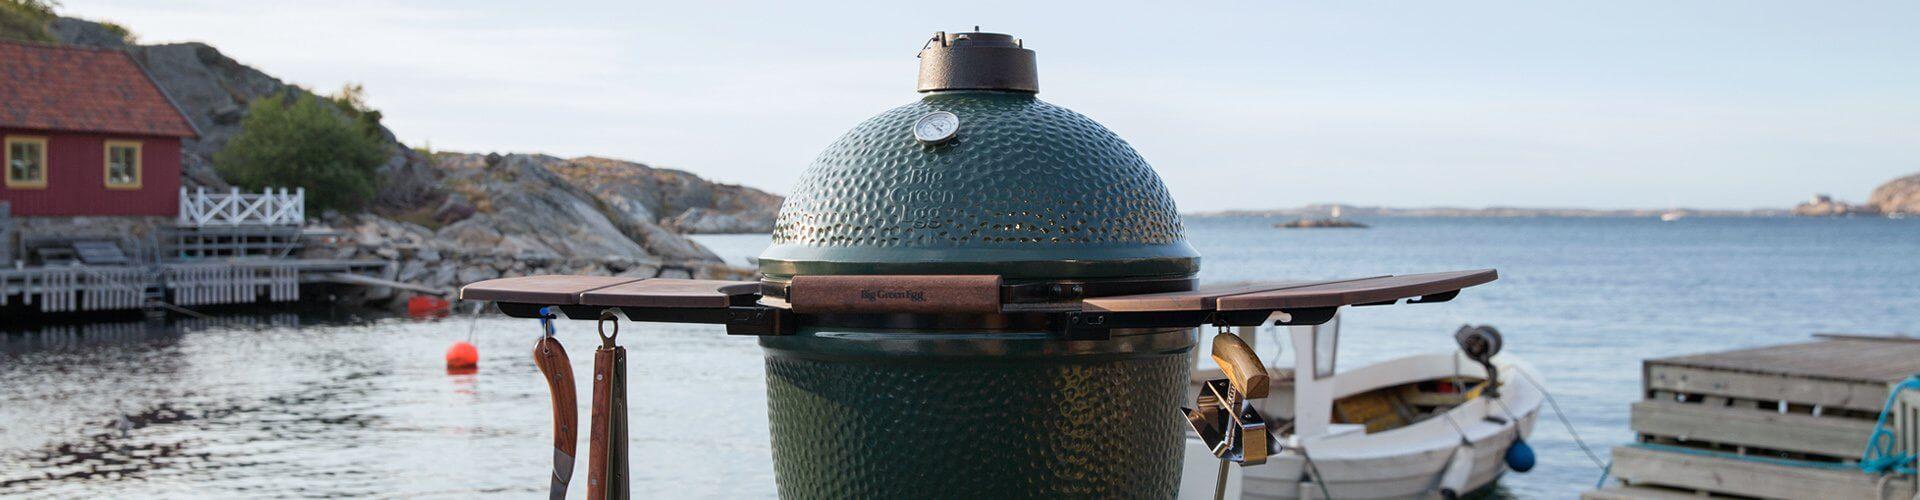 Big green egg barbecue header